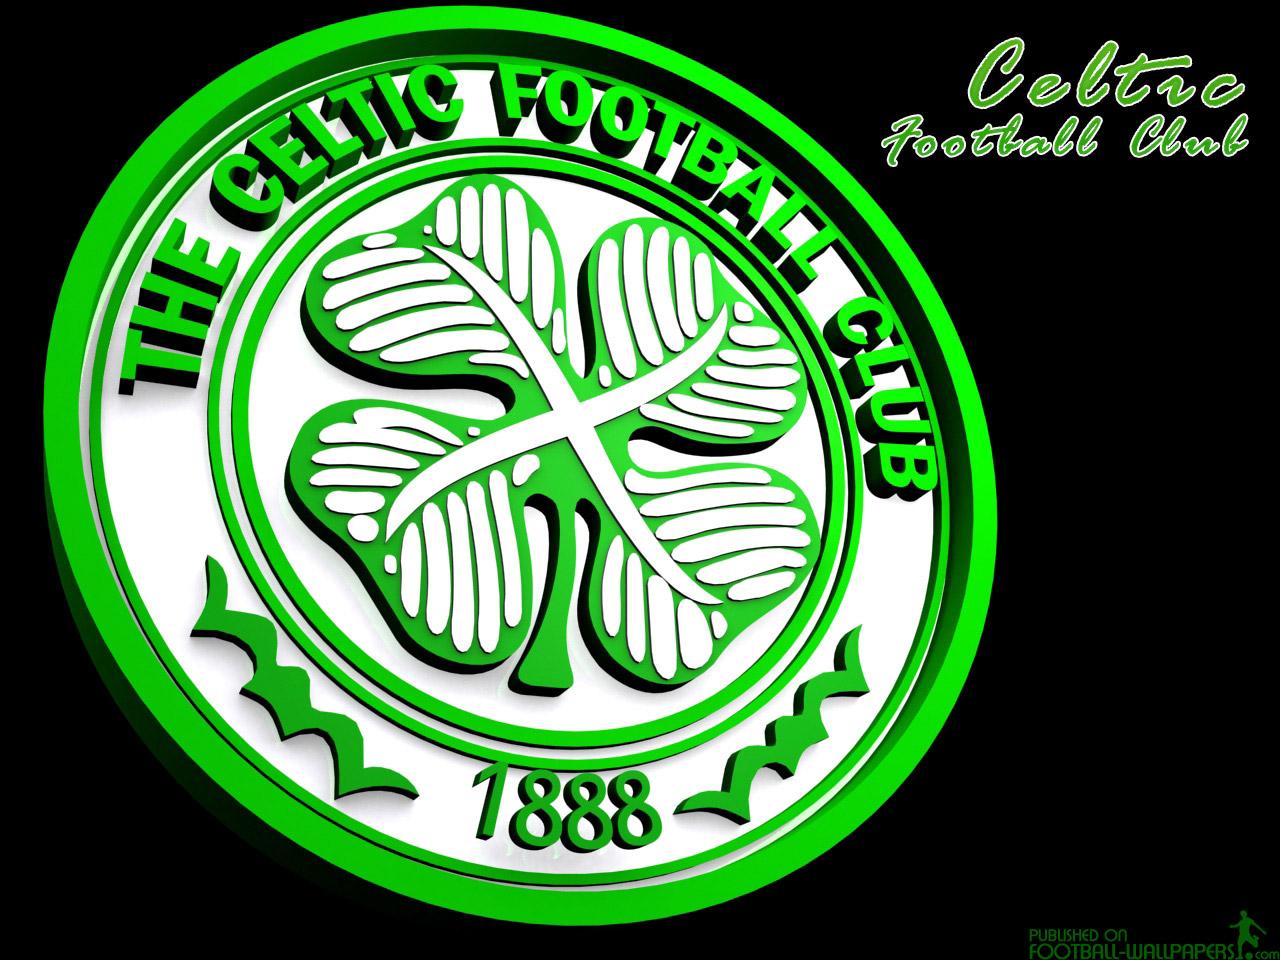 celtic fc - photo #10